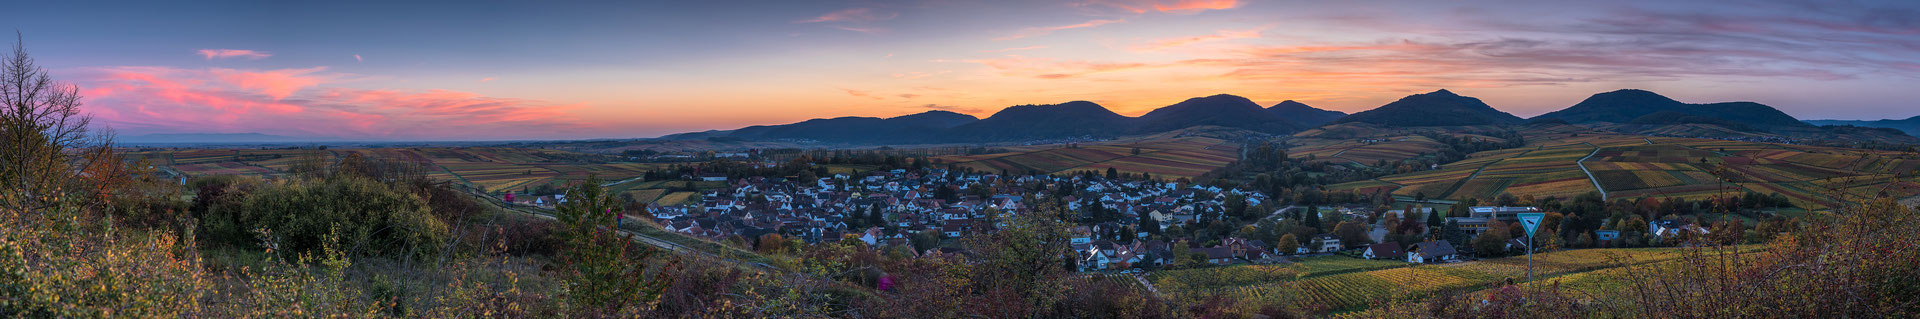 Sonnenuntergang an der Kleinen Kalmit